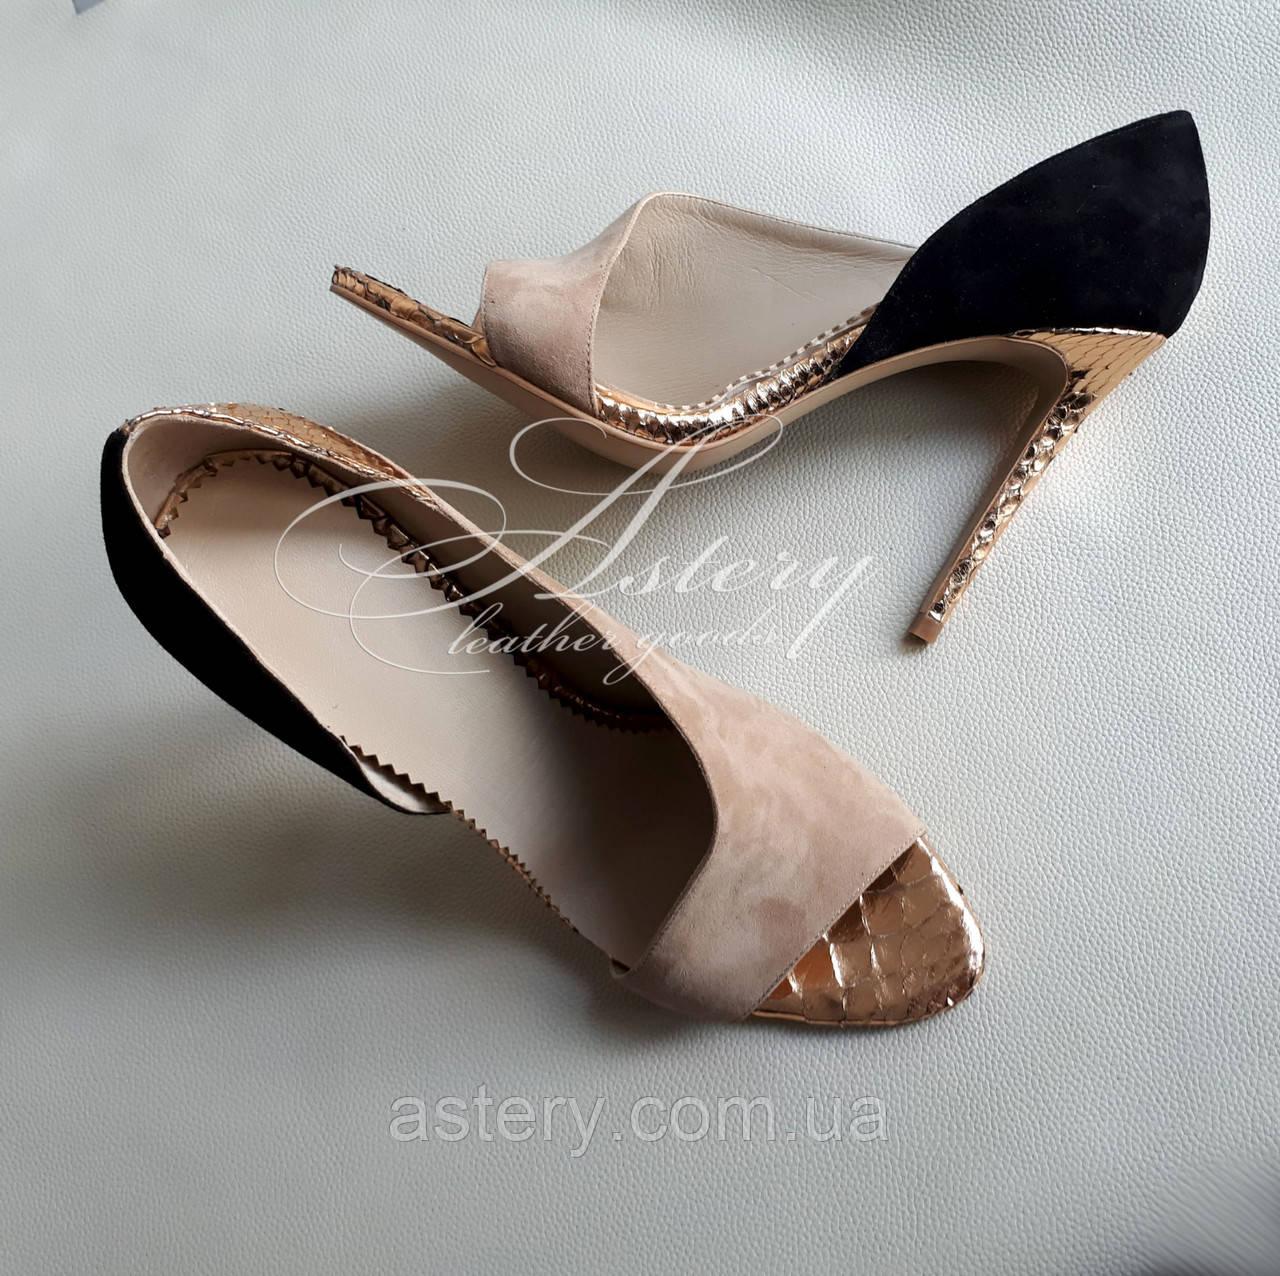 Женские босоножки на каблуке черно бежево золотые